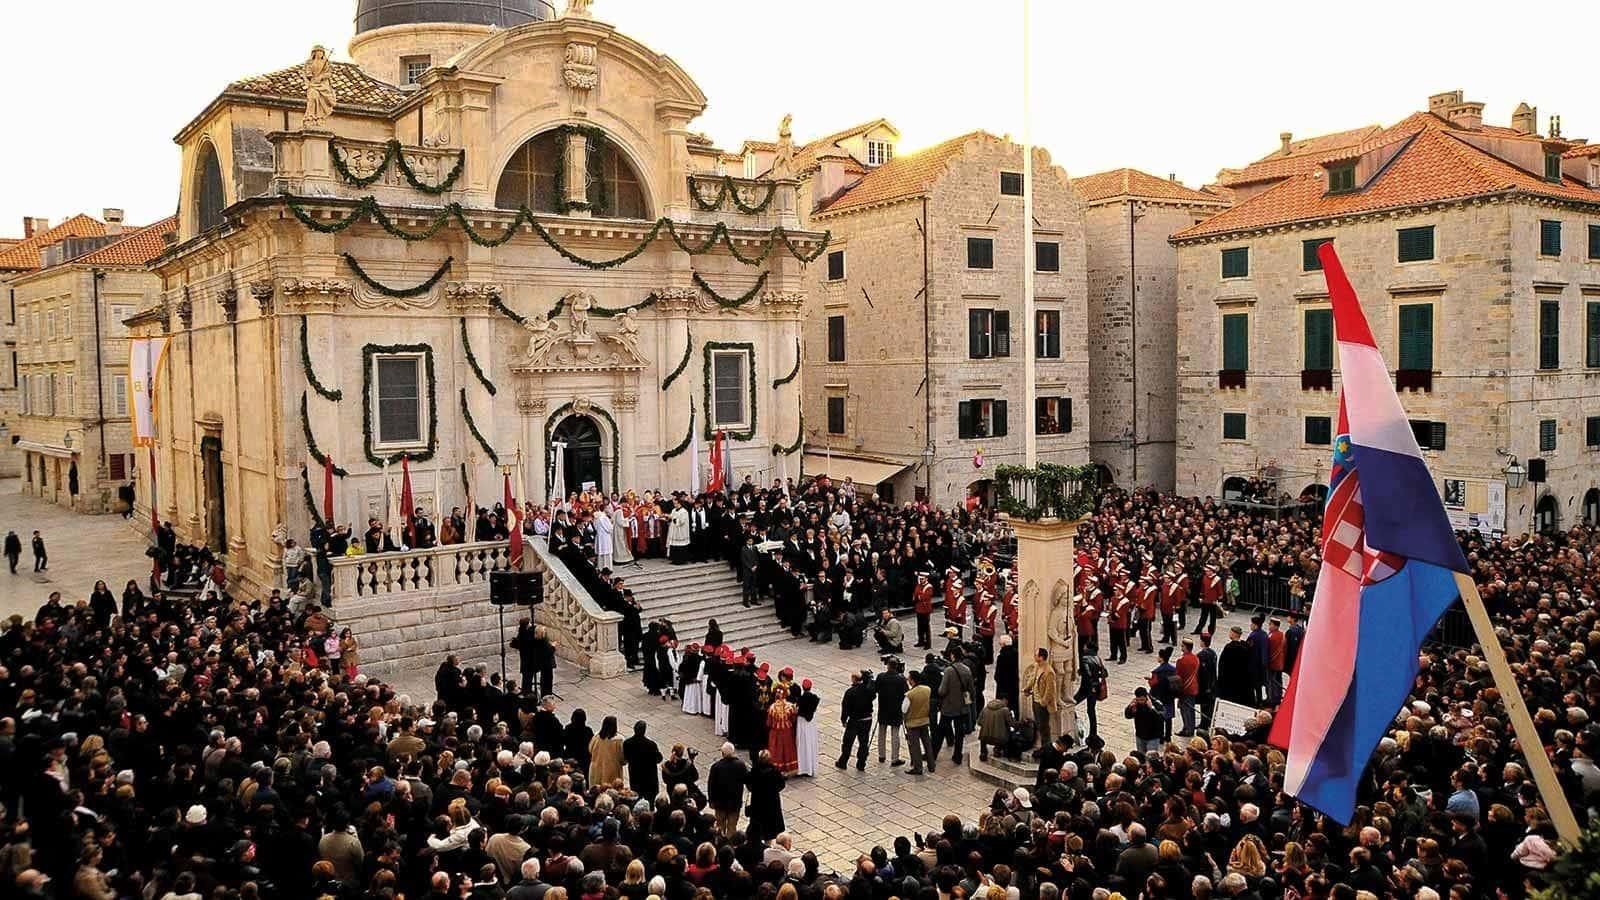 Festival of Saint Blaise - Sveti Vlaha, Dubrovnik, Croatia